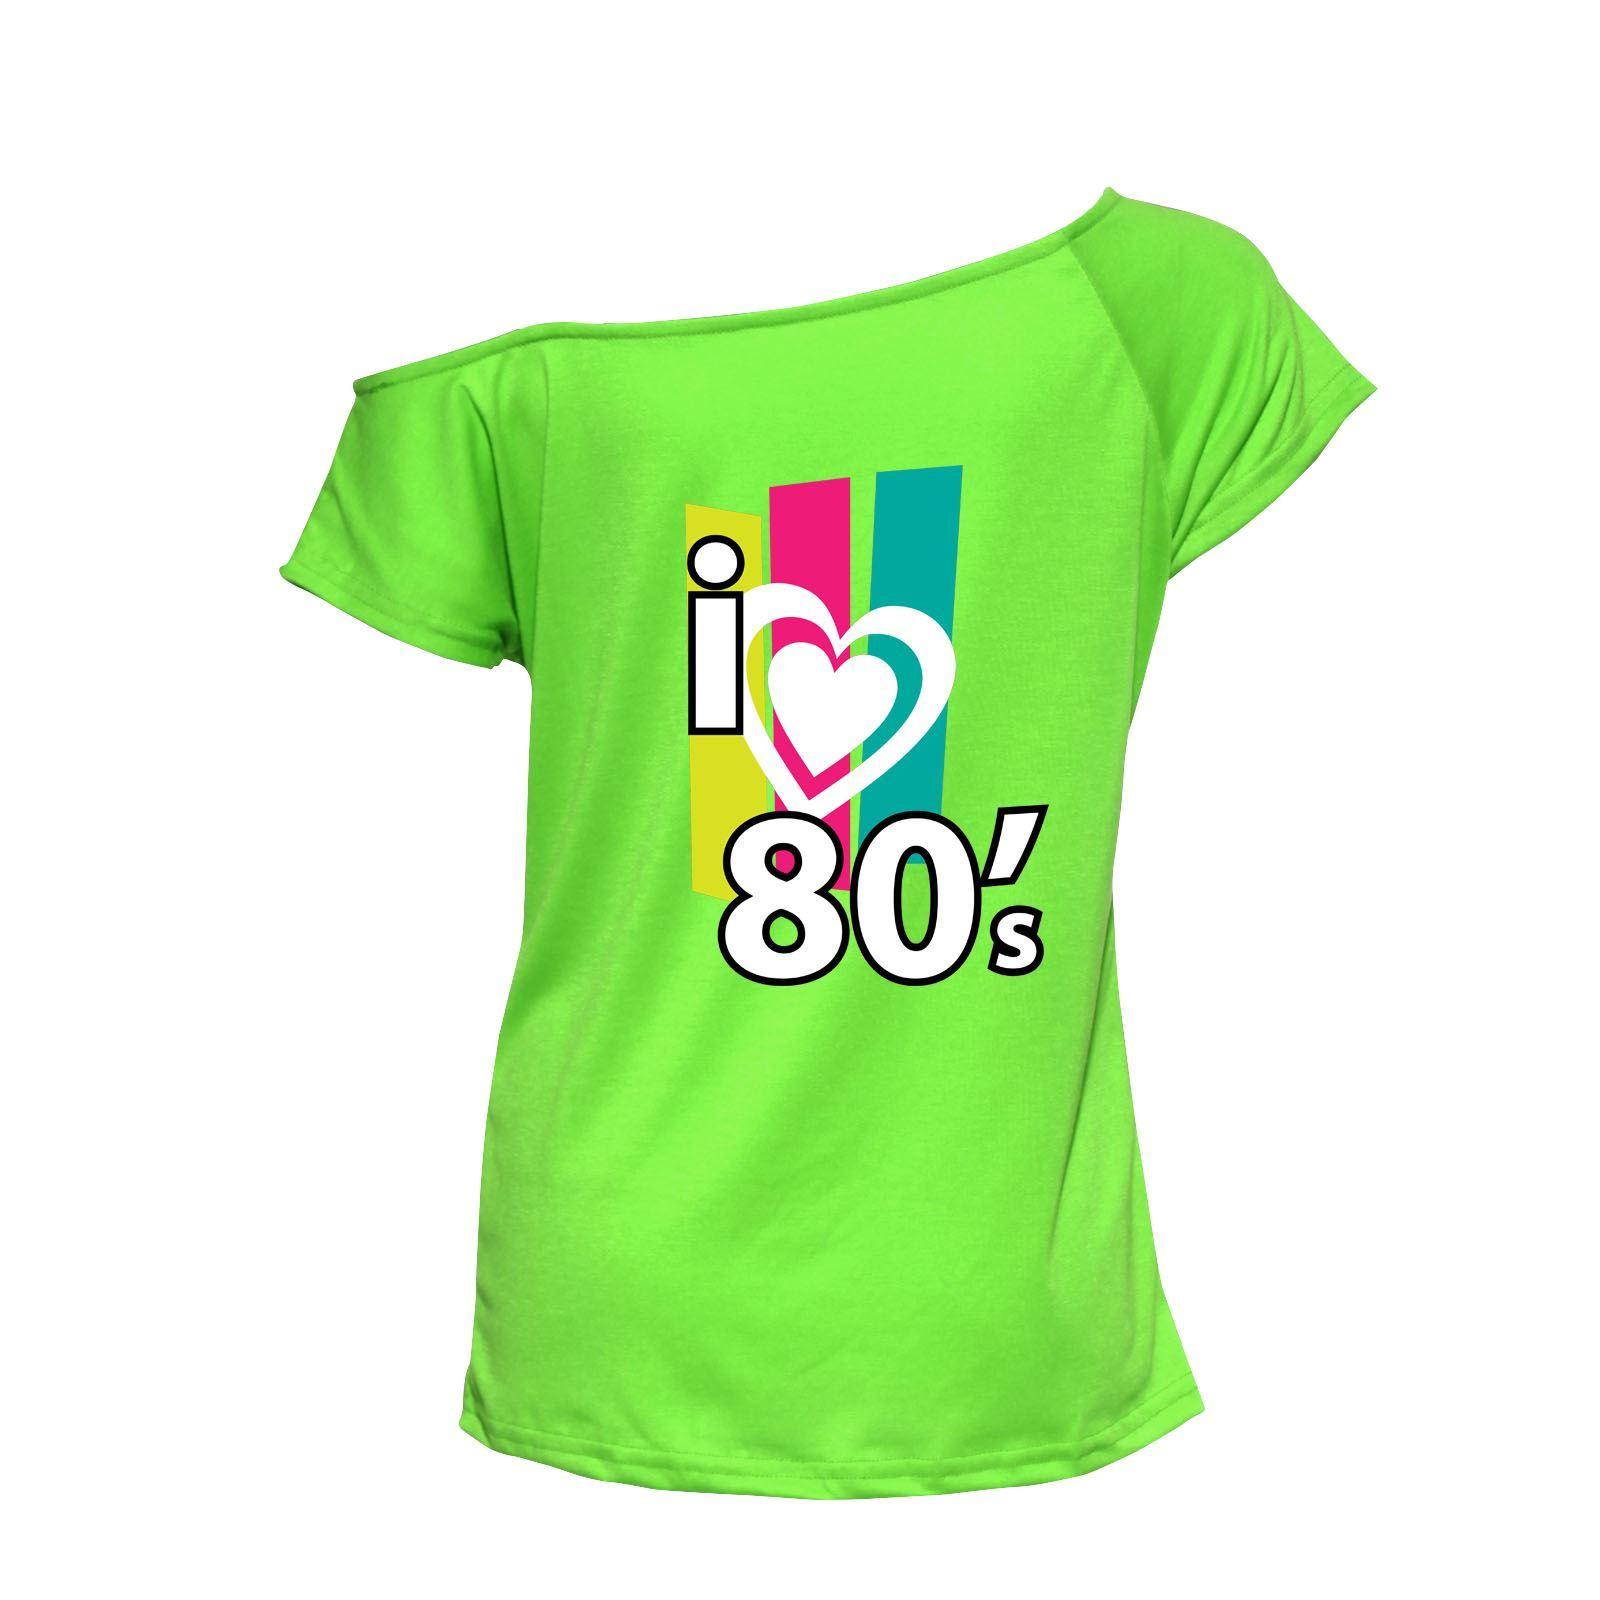 Me-encanta-la-musica-80s-Top-senoras-gallina-Fiesta-Festival-Traje-Camiseta-6021741